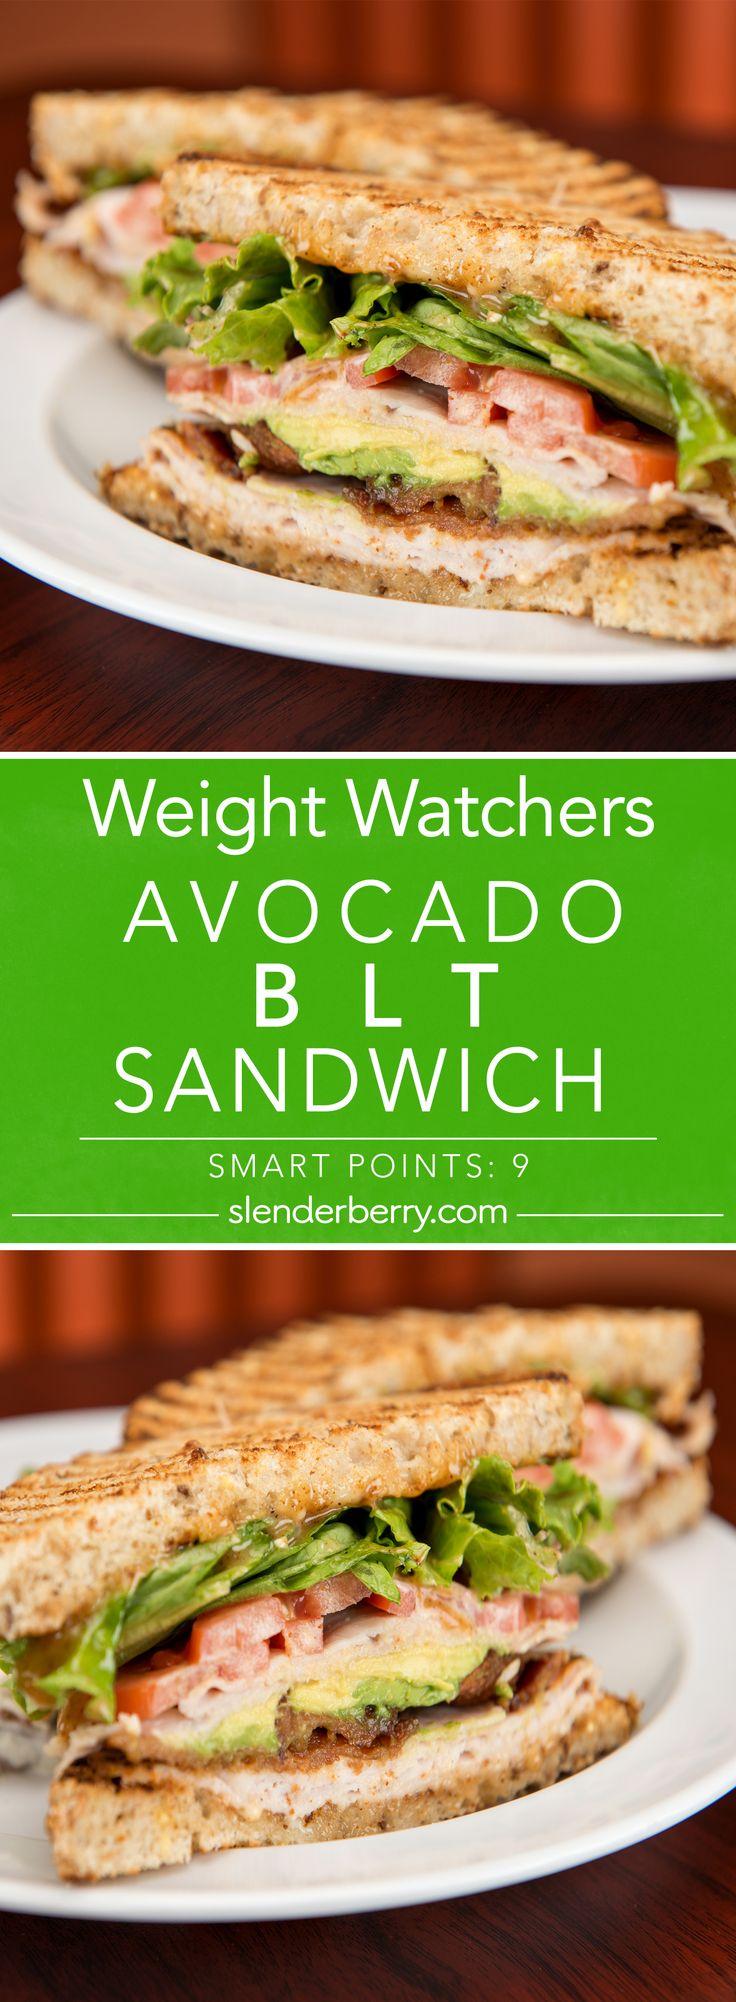 Weight Watchers Avocado BLT Sandwich Recipe - 9 Smart Points